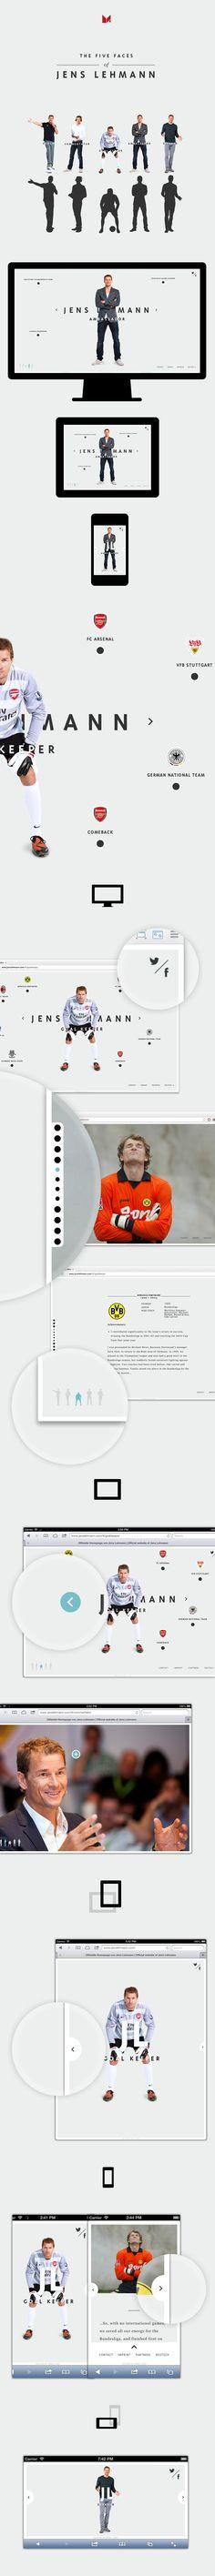 New Website for Jens Lehmann (former German National Goalkeeper) designed by MING Labs